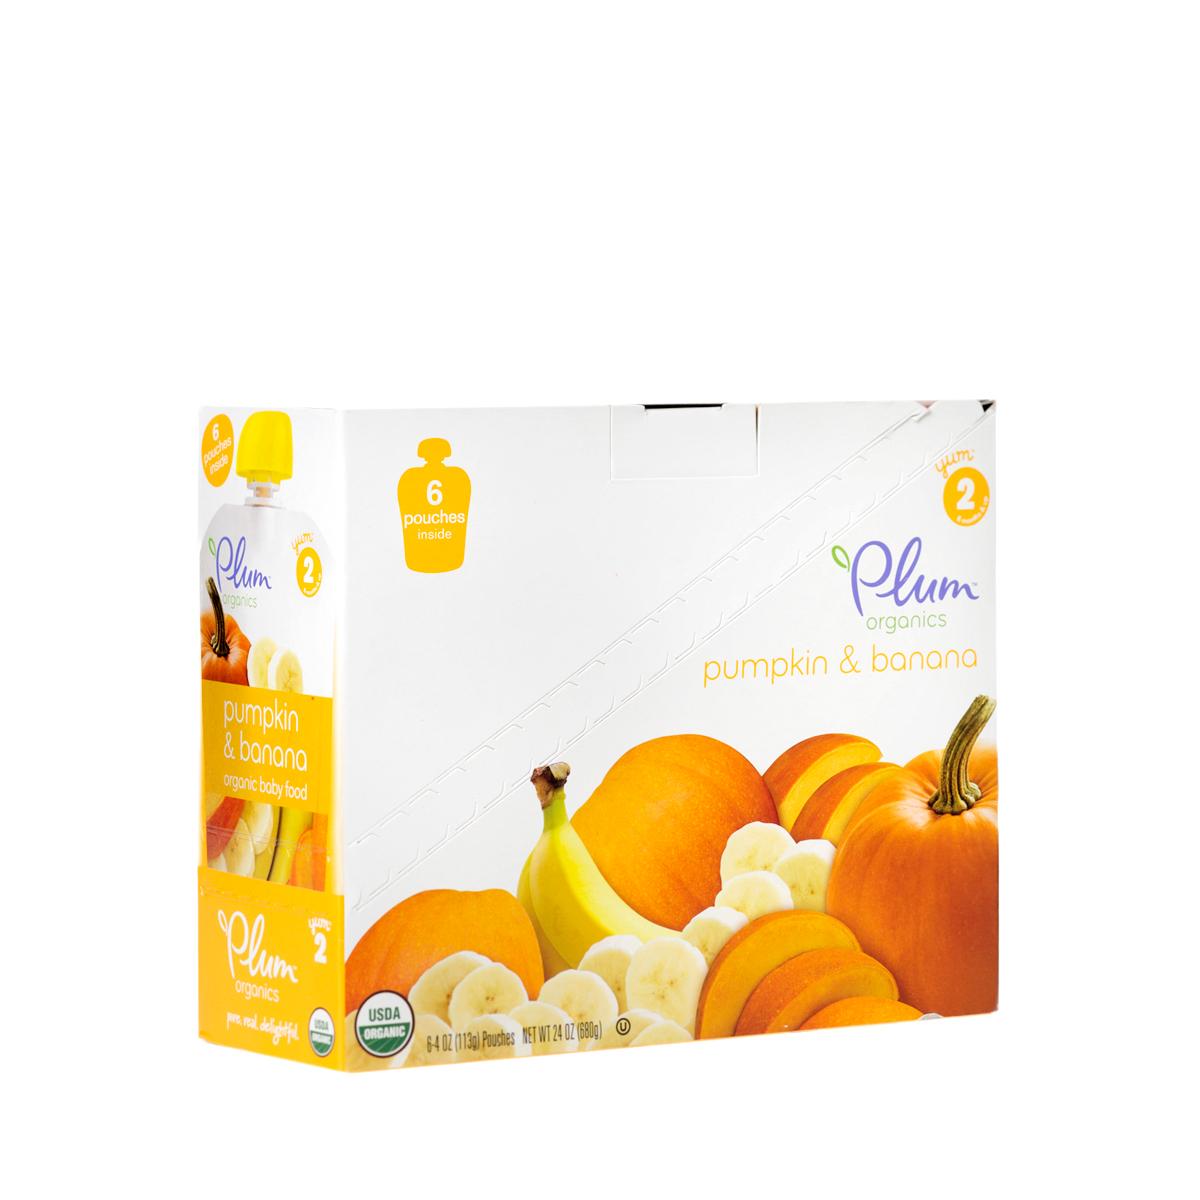 PLUM Pumpkin & Banana Baby Food